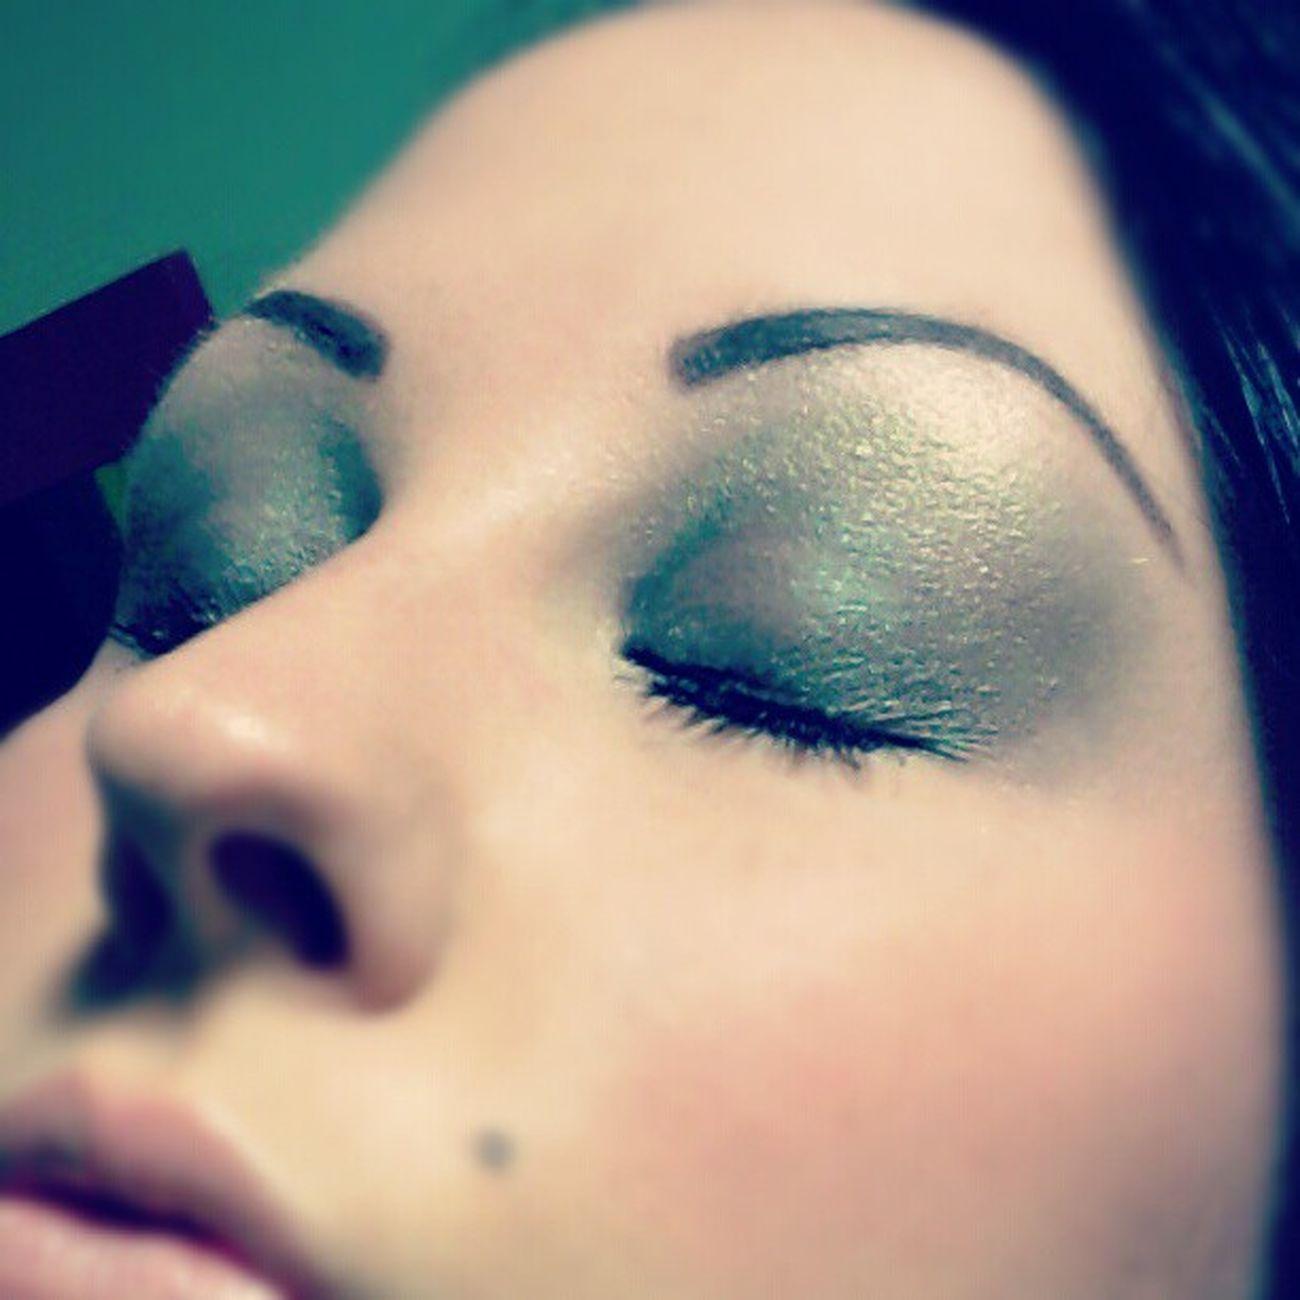 Muotd Makeupoftheday Toofacedmakeup TooFaced greenmakeup goldmakeup tattooedeyebrows